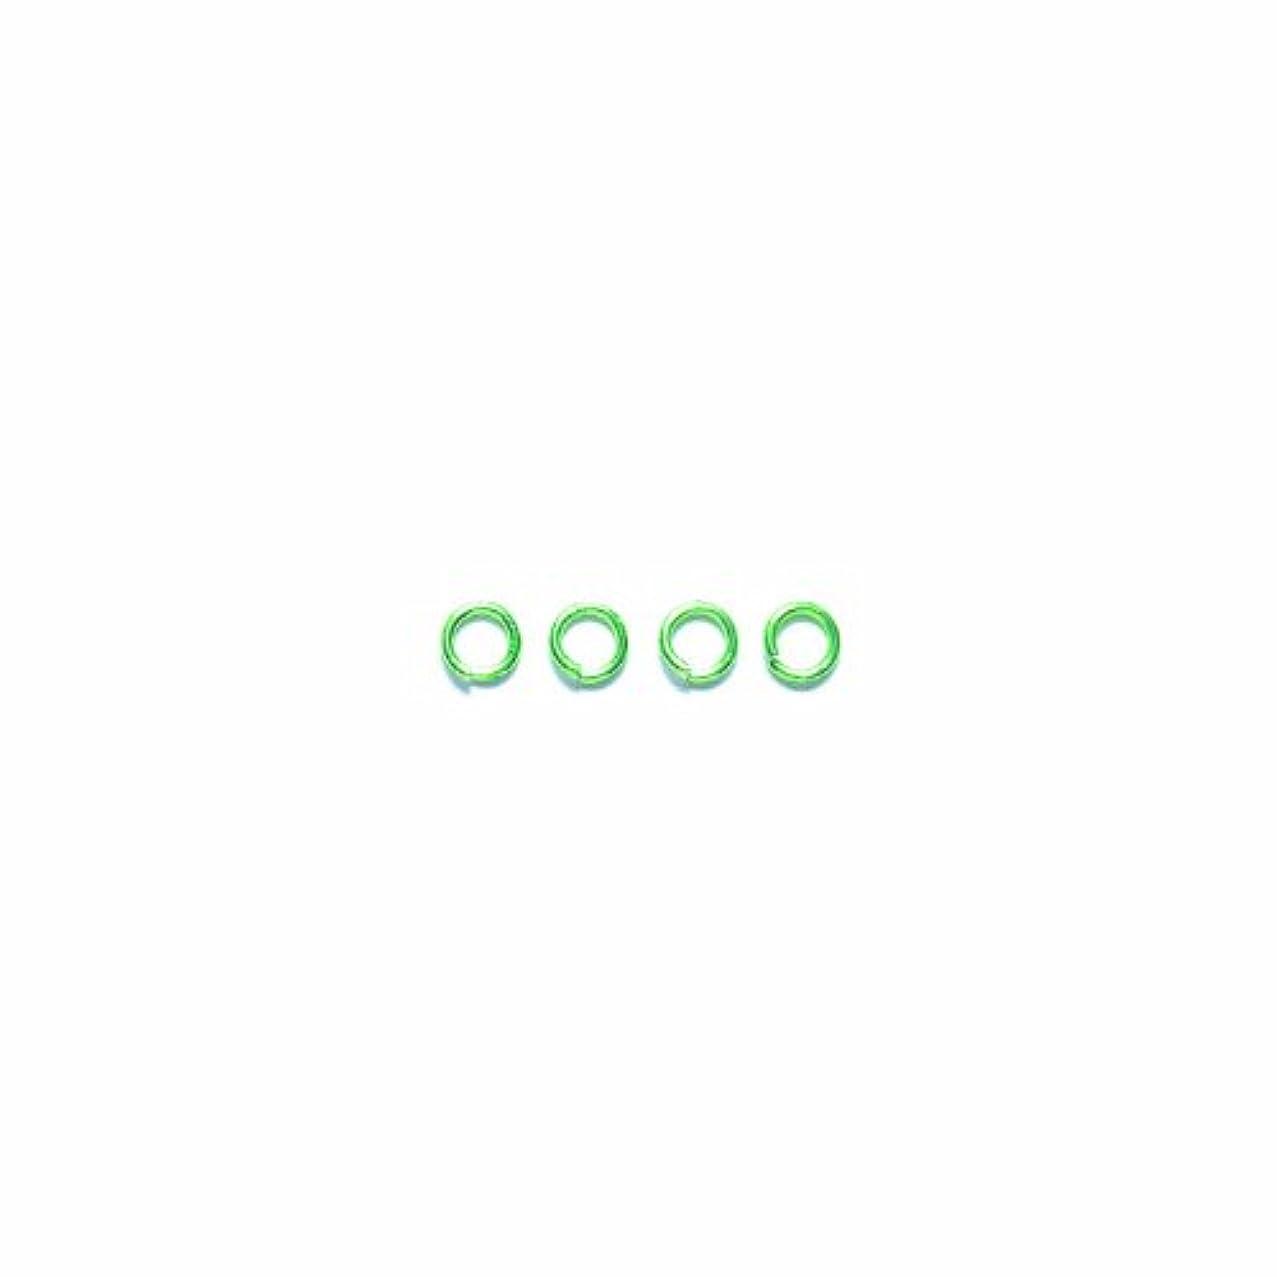 Shipwreck Beads Electroplated Brass Jump Ring, 4 mm, 19-Gauge, Metallic, Lime Green, 50 gm Pack